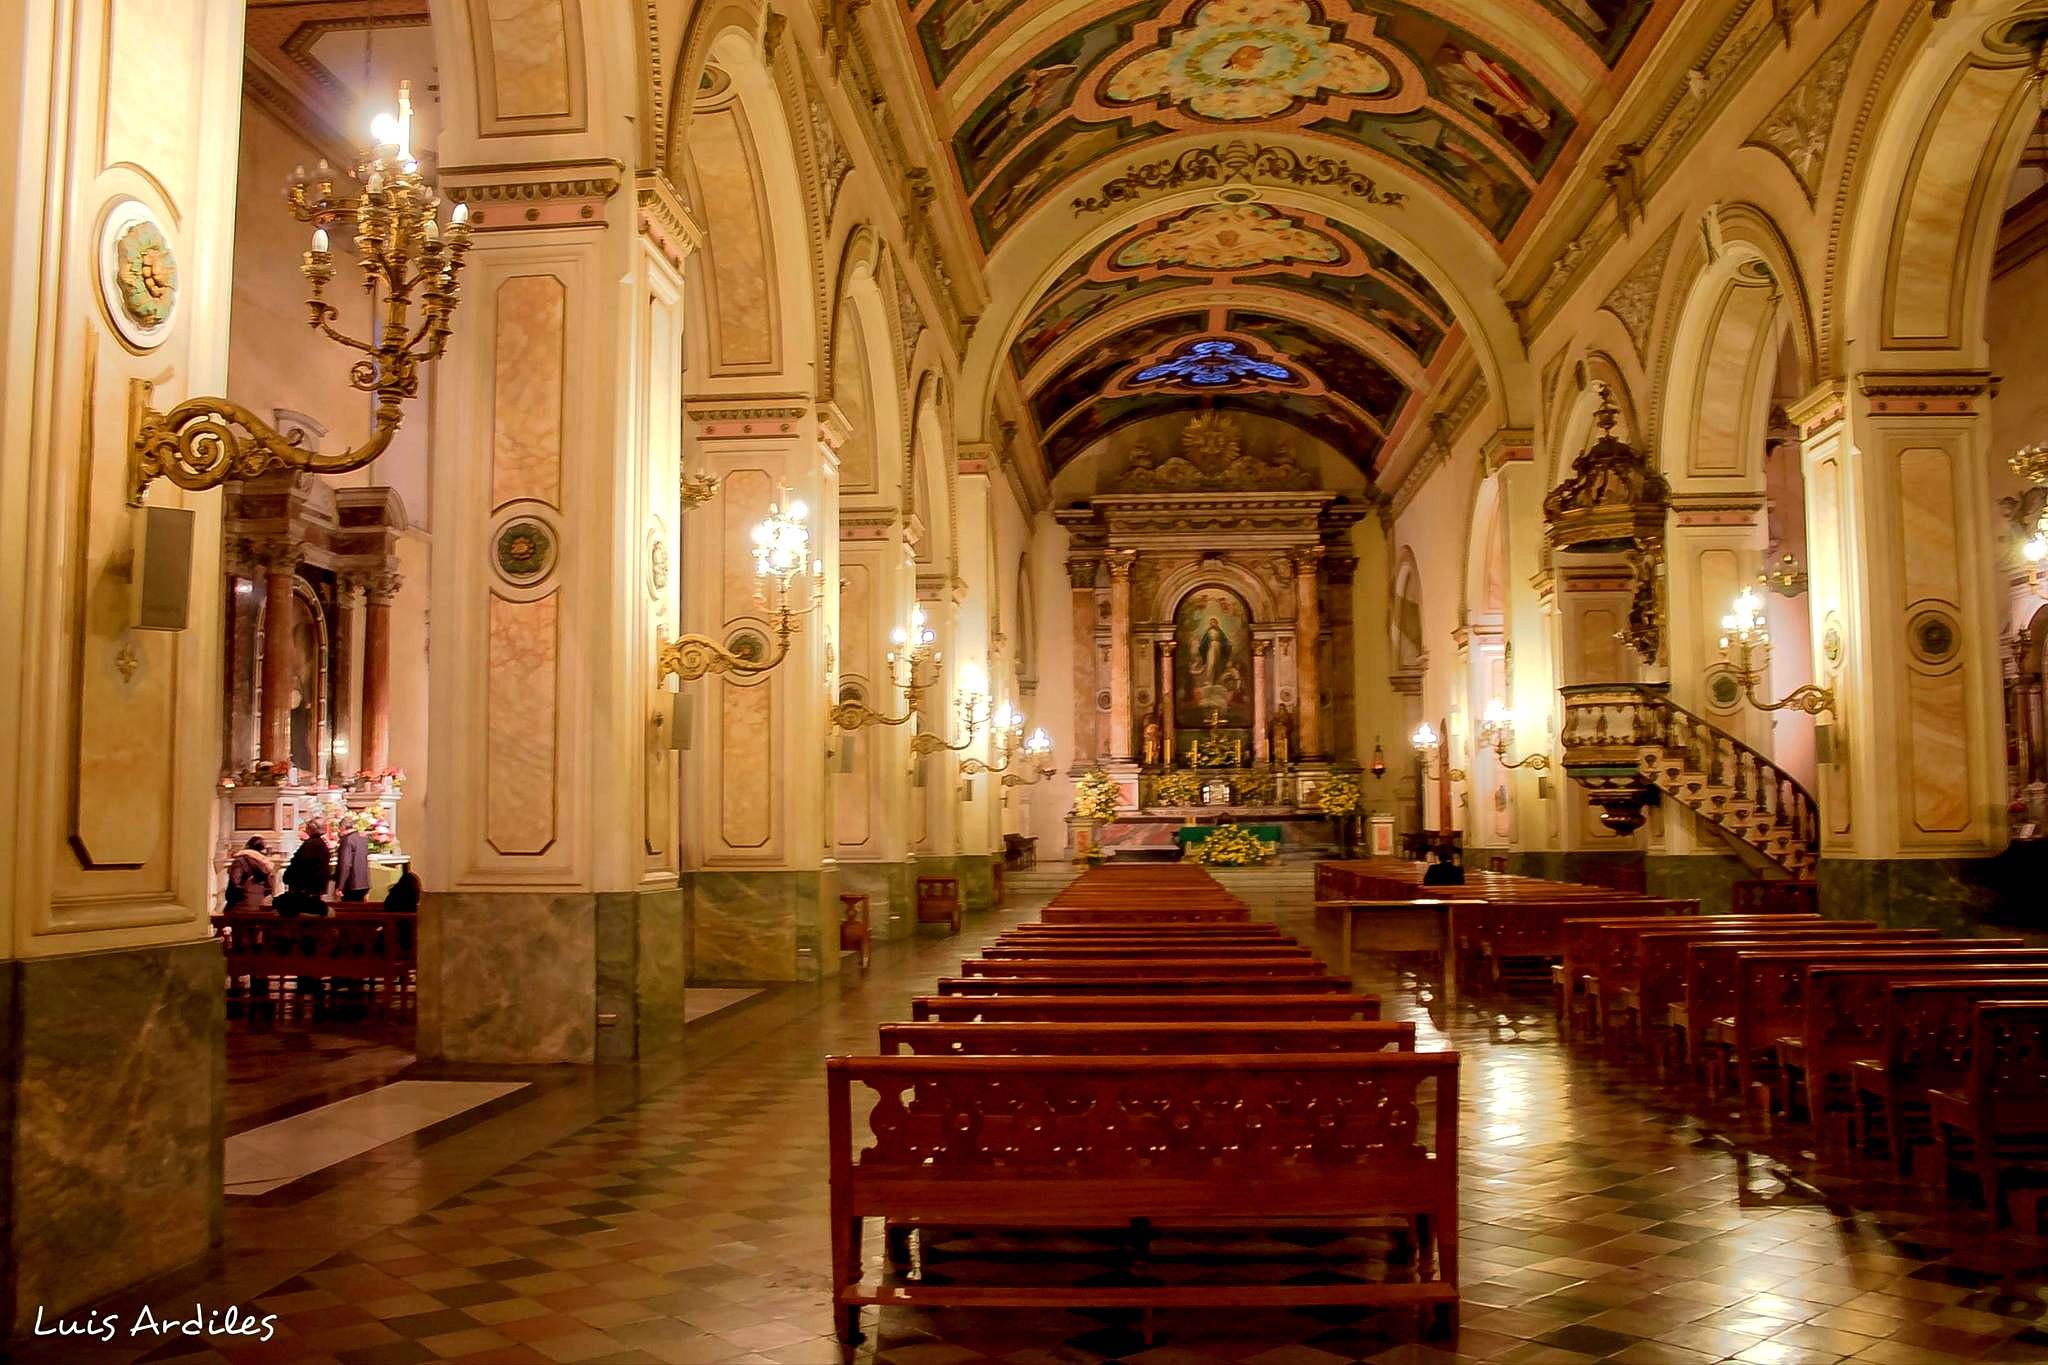 iglesia de la mercedes , santiago centro ,, chile  by Luis Ardiles Ibarra